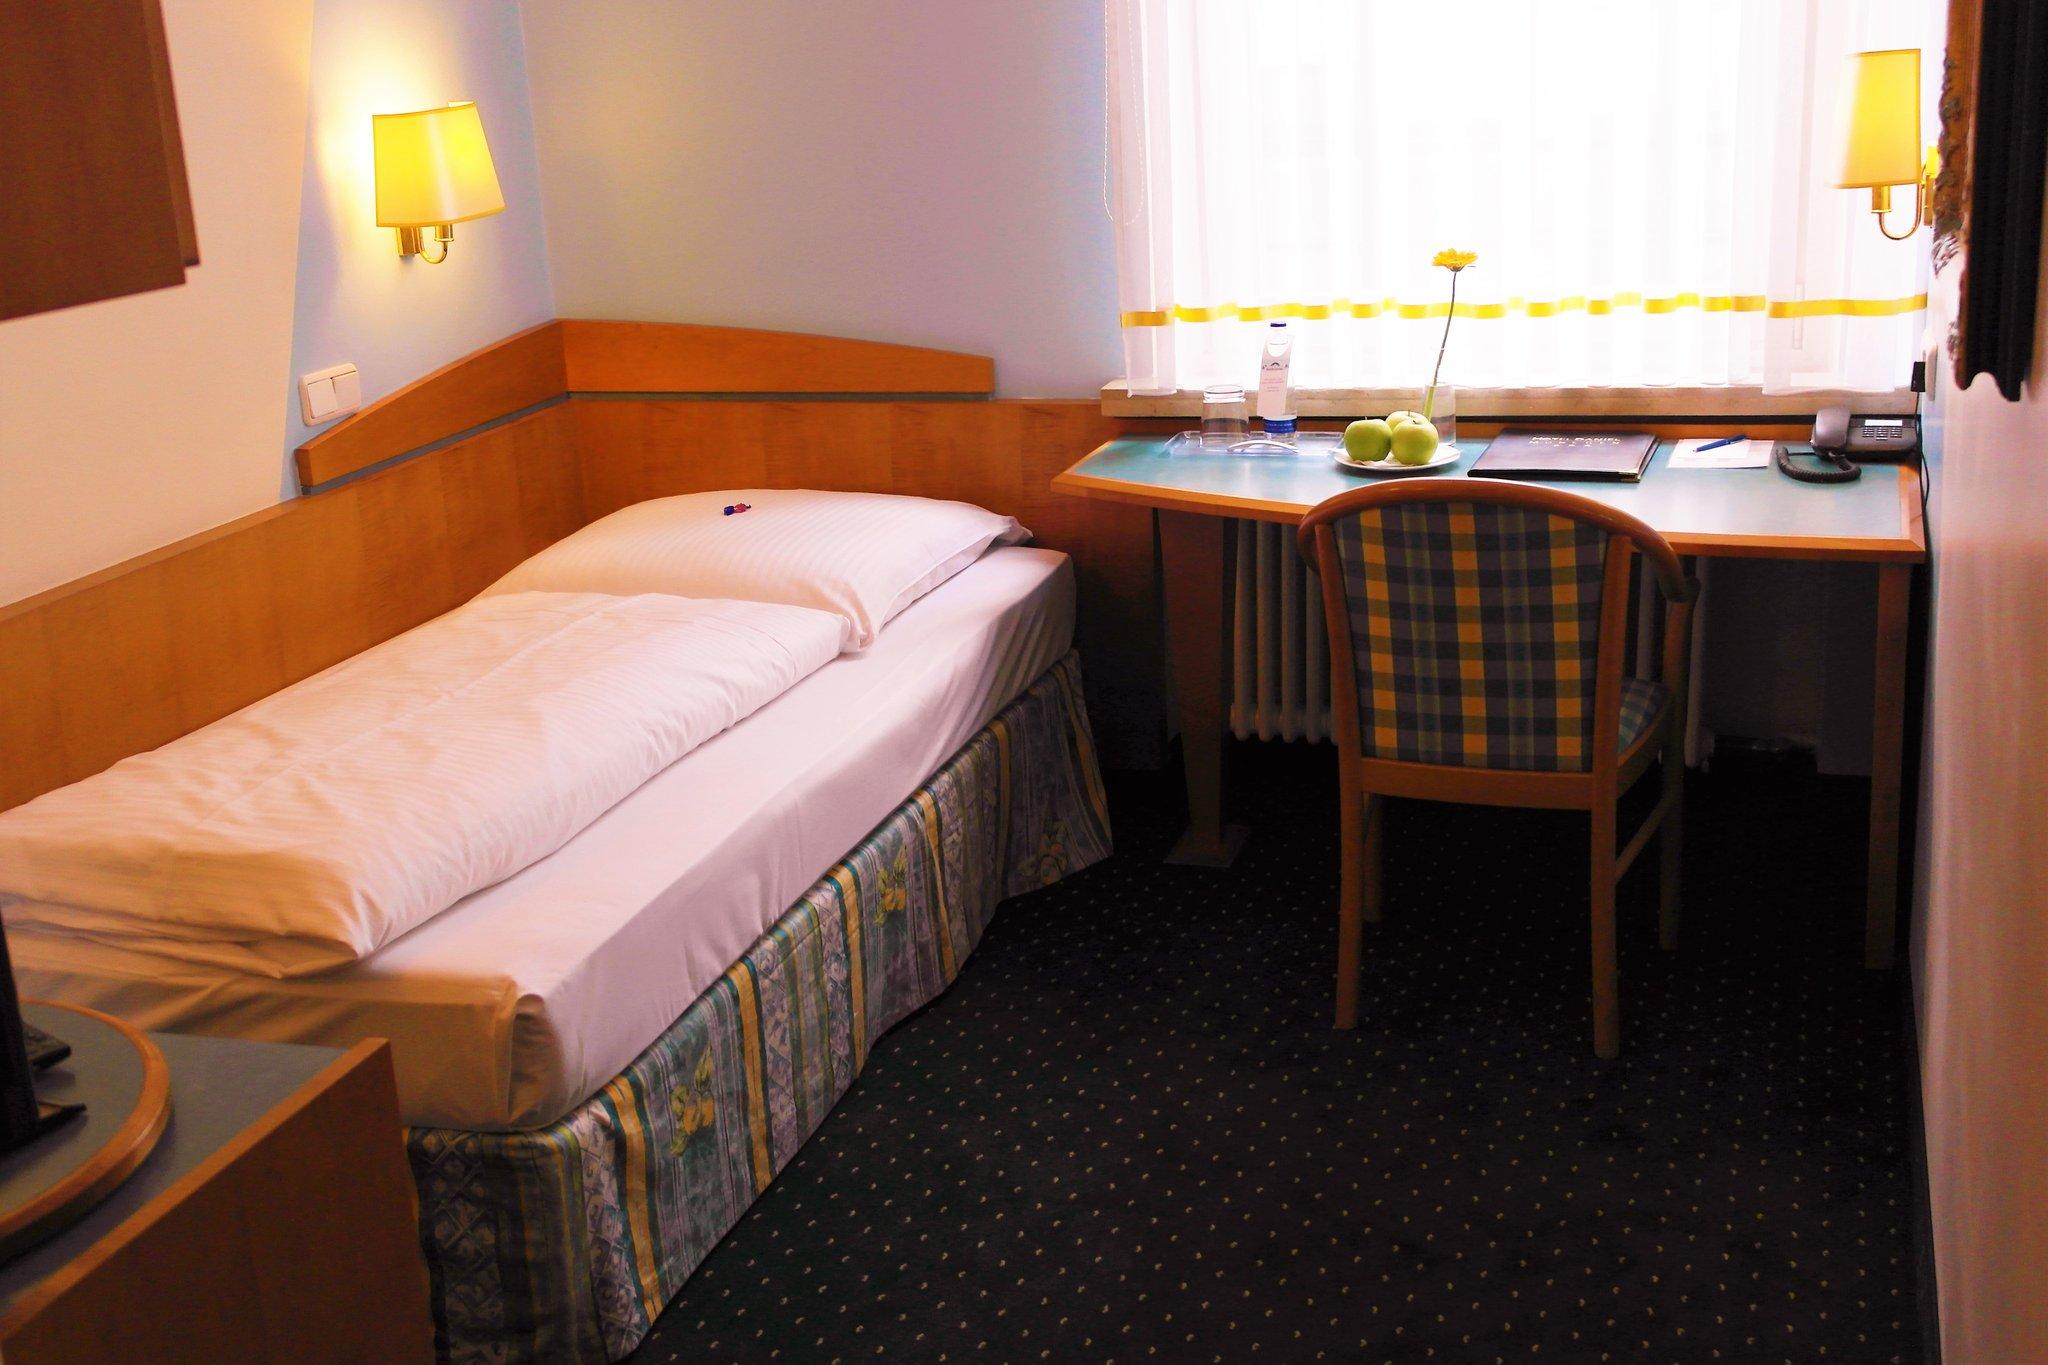 offerte weekend a monaco offerte di vacanze lowcost. Black Bedroom Furniture Sets. Home Design Ideas